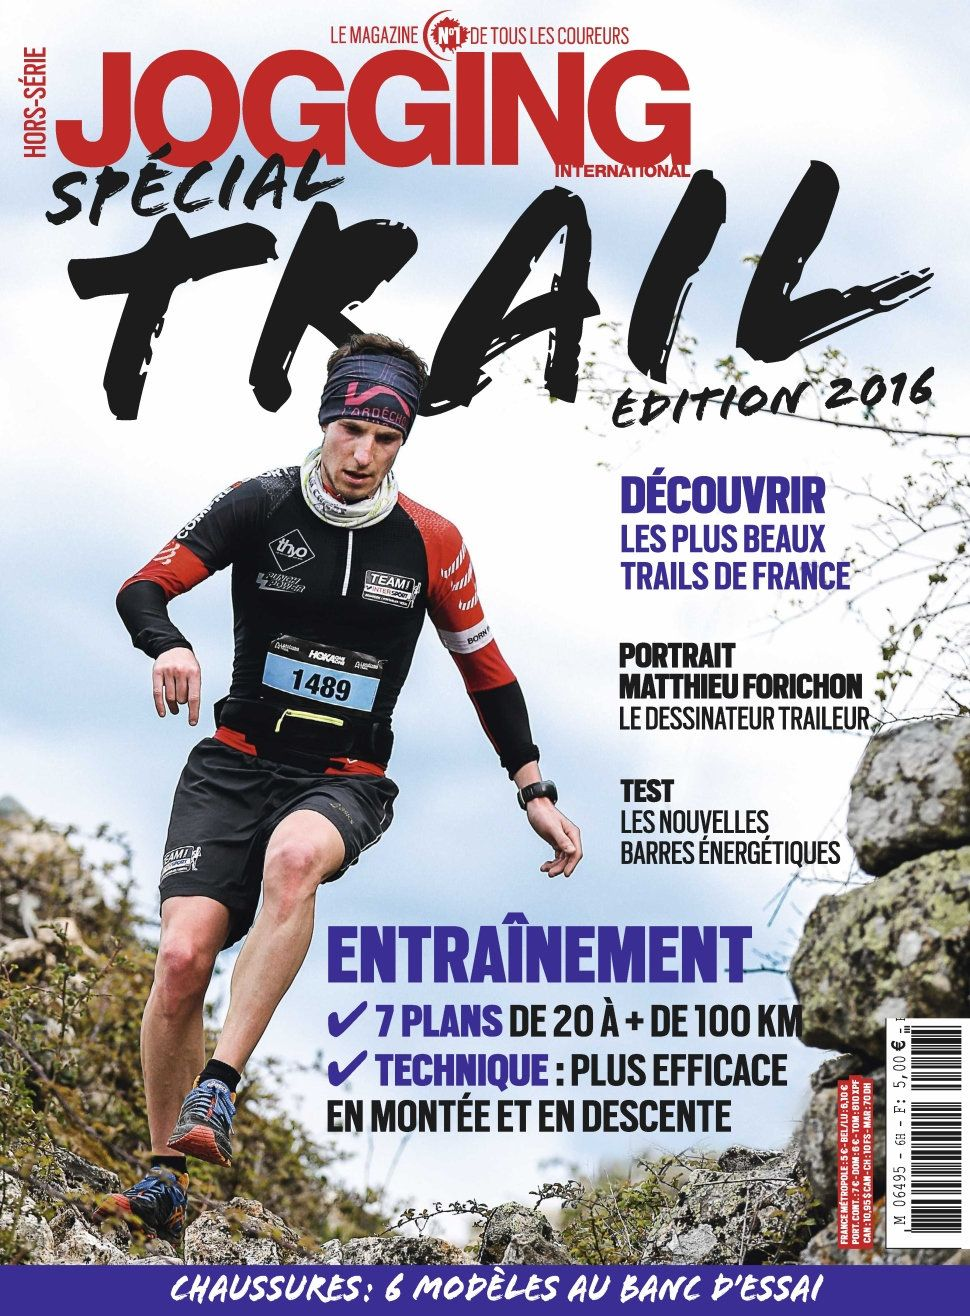 Jogging International Hors-Série 2027 - Spécial Trail Edition 2016